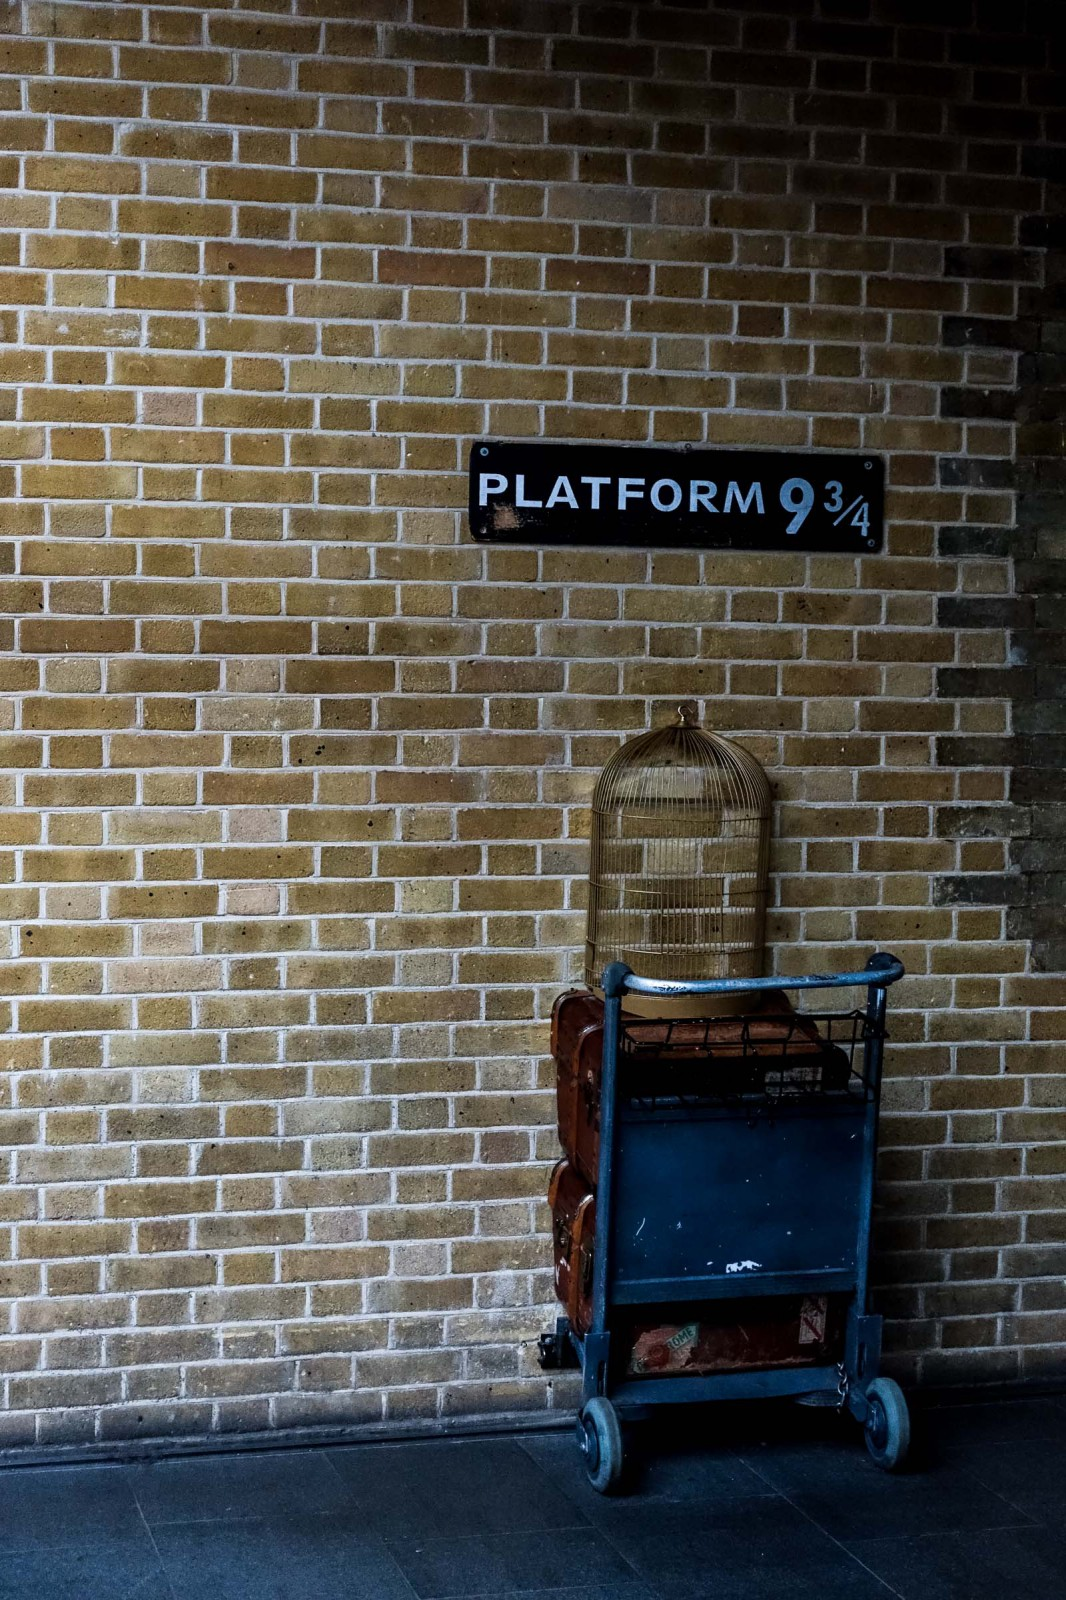 London Platform 9 3/4